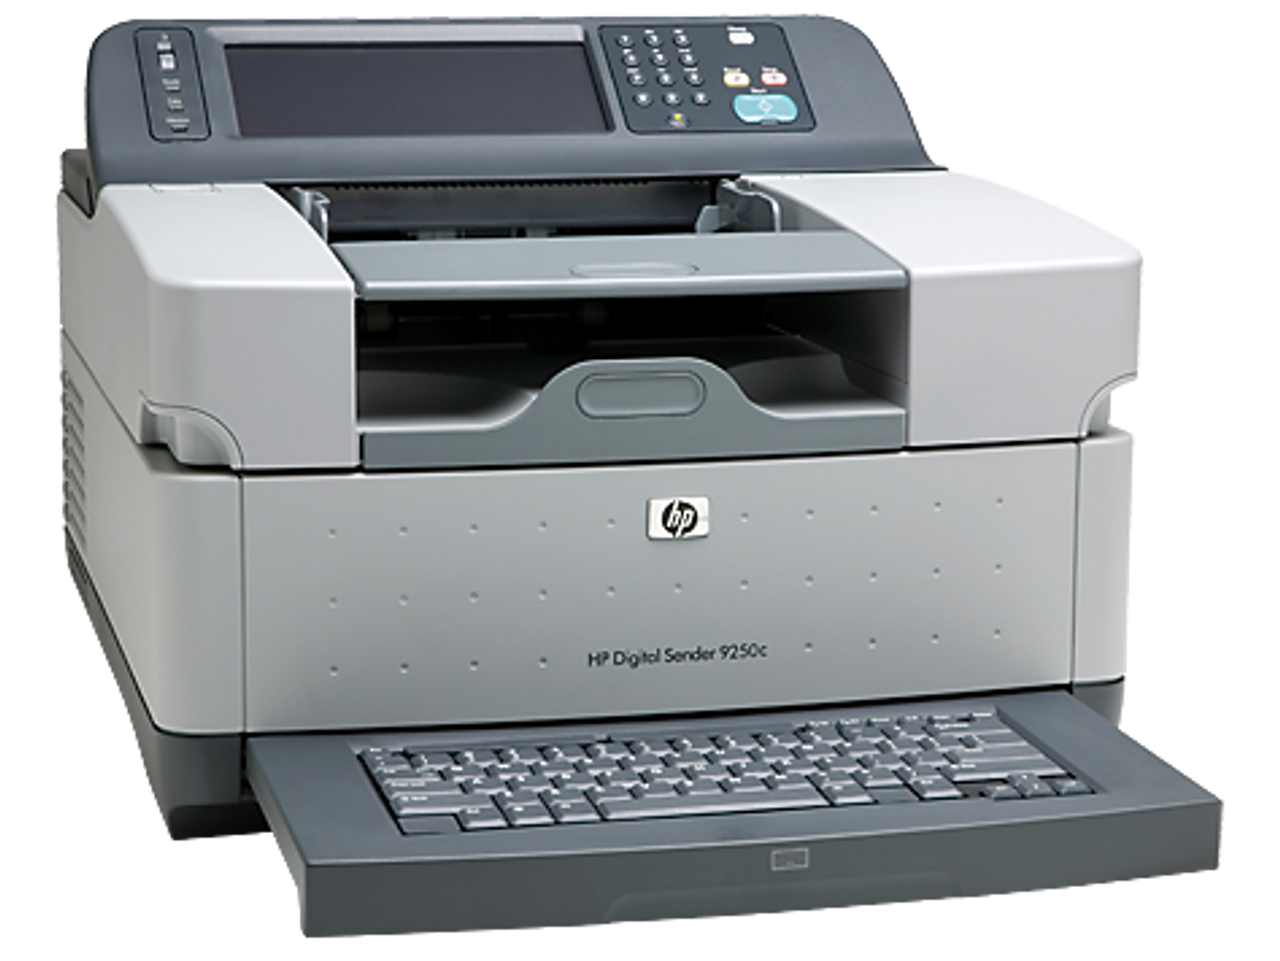 HP Digital Sender 9250c - 600 dpi x 600 dpi - Document scanner